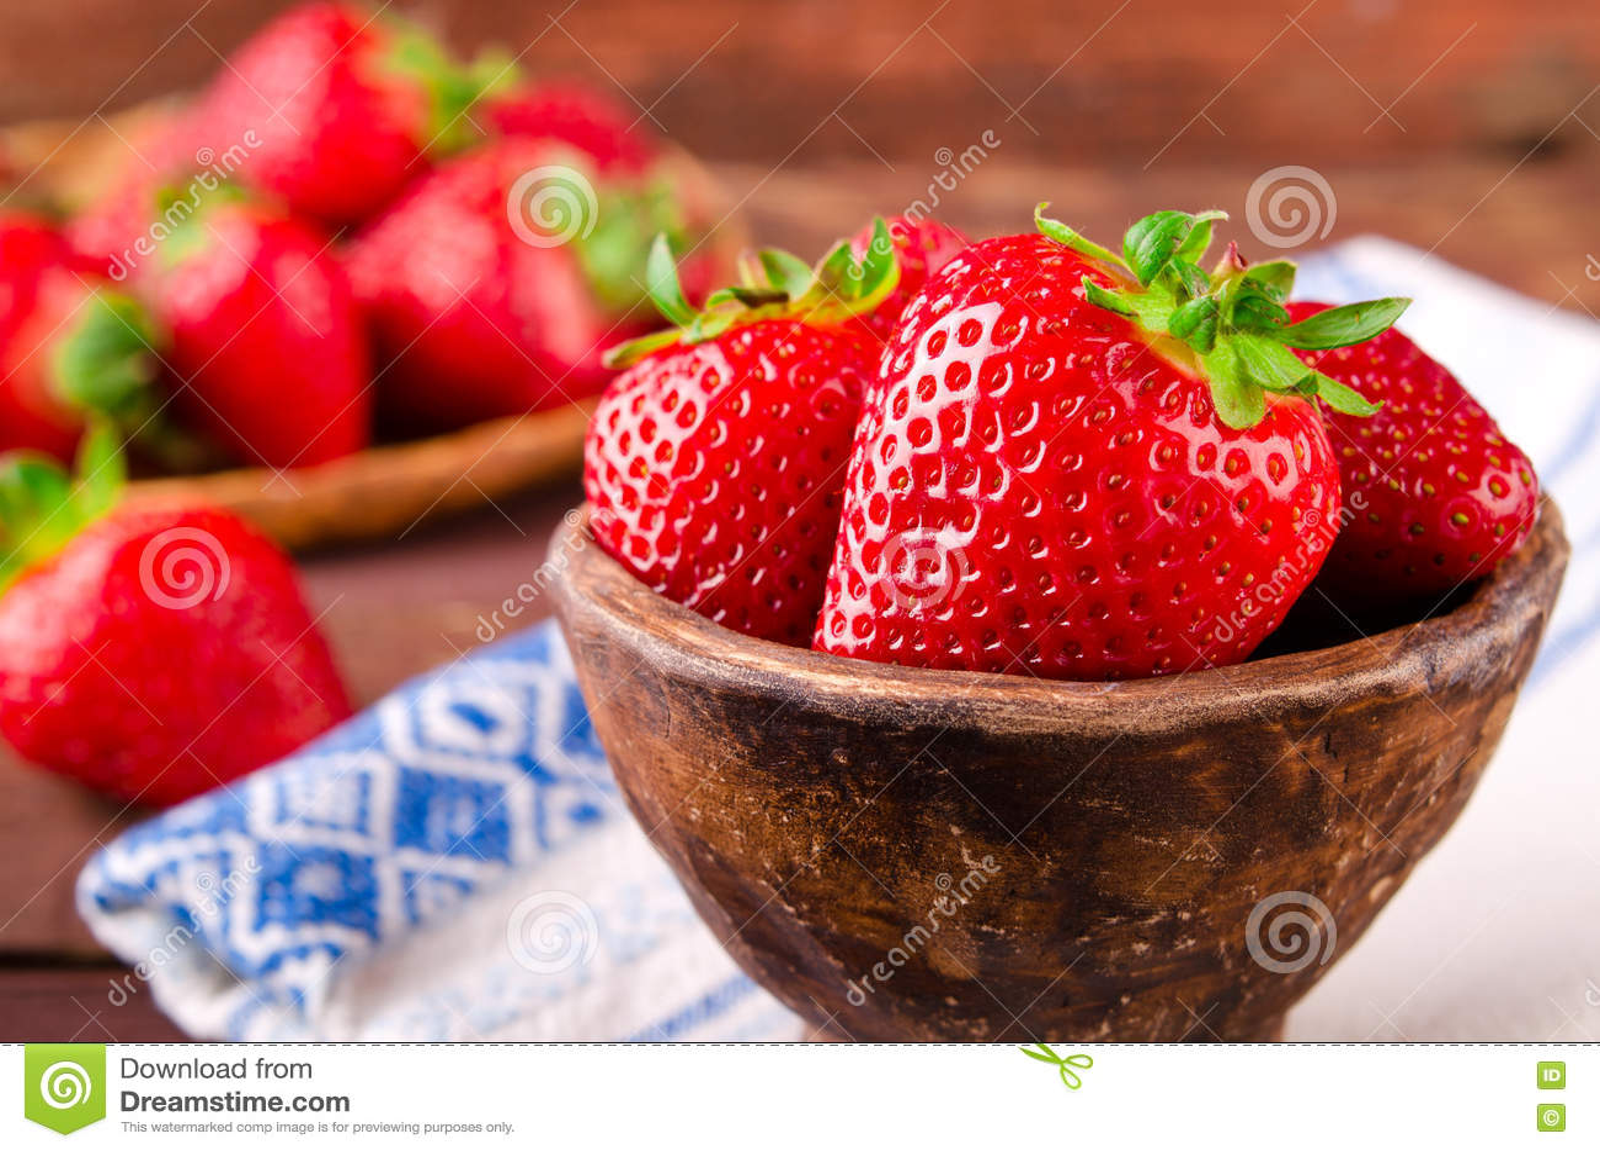 Ripe fresh juicy organic strawberries in old clay bowl